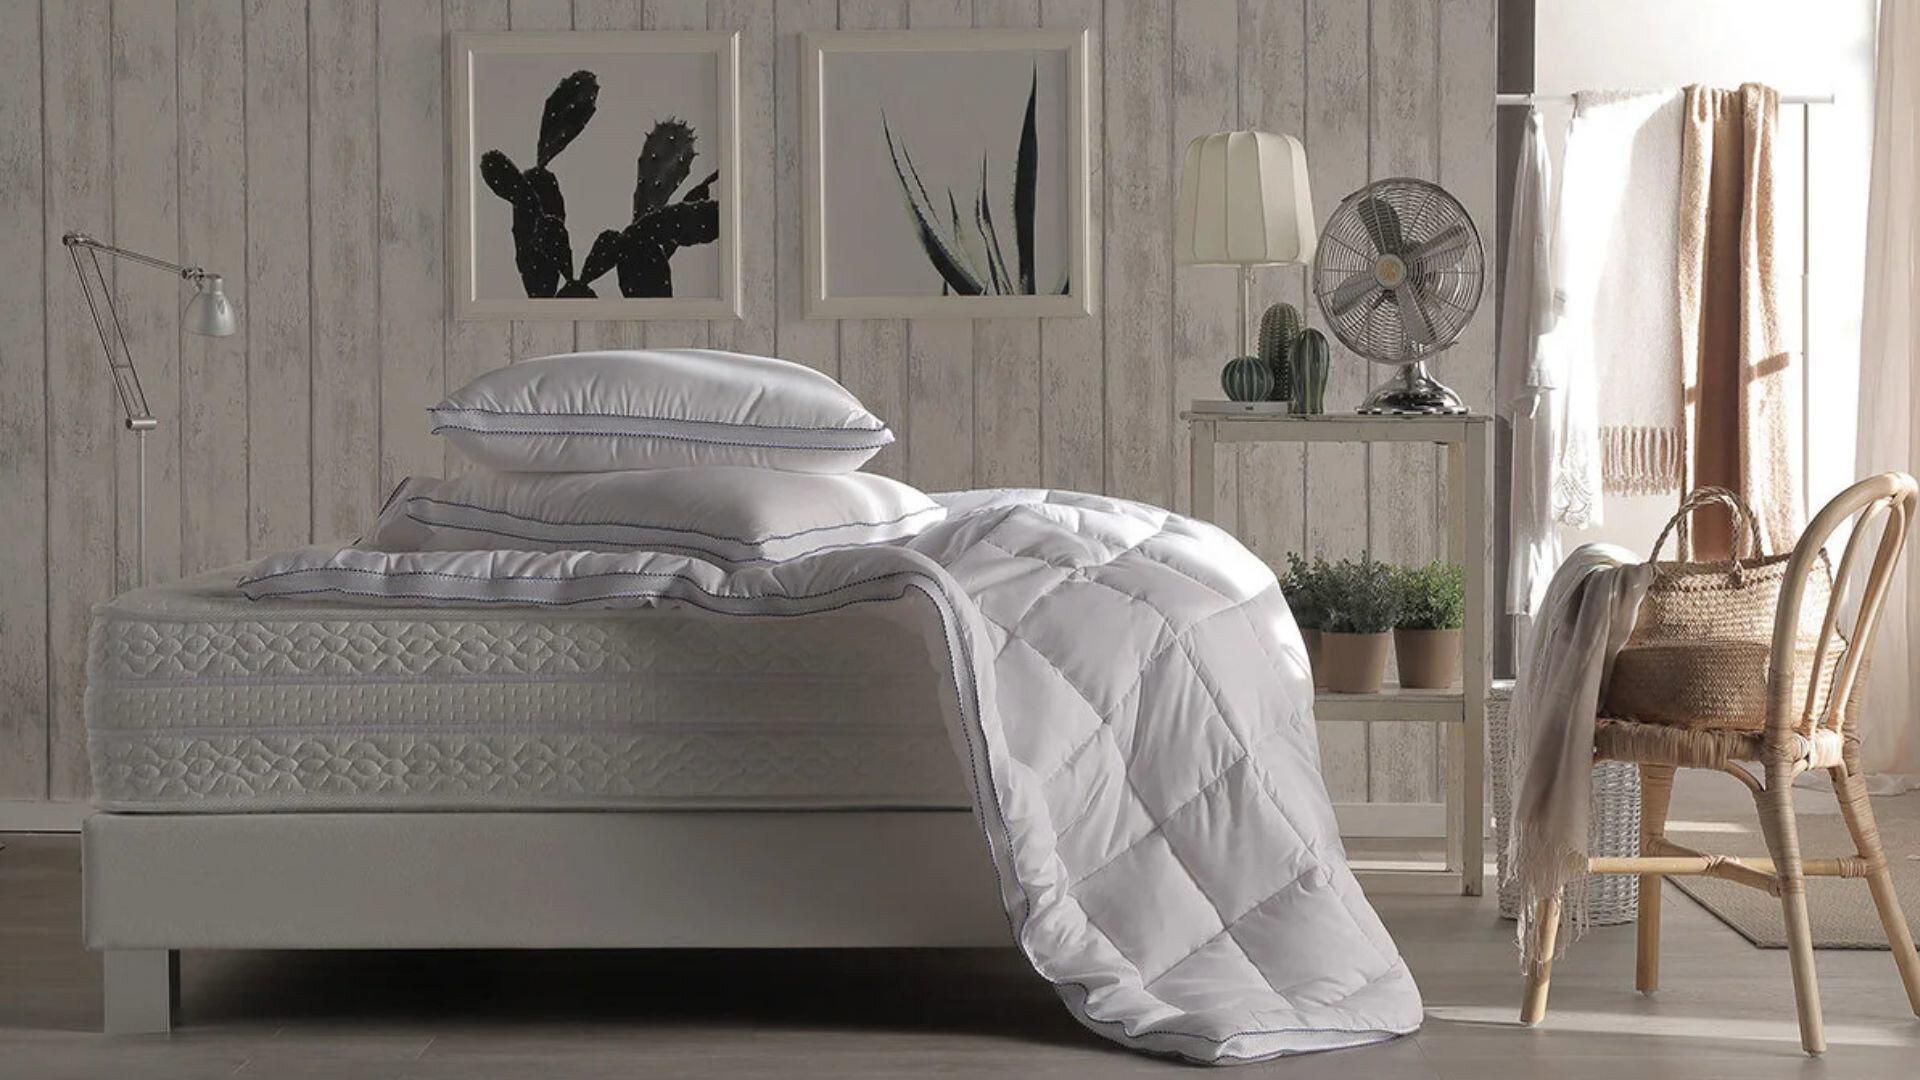 Air Up Pillows